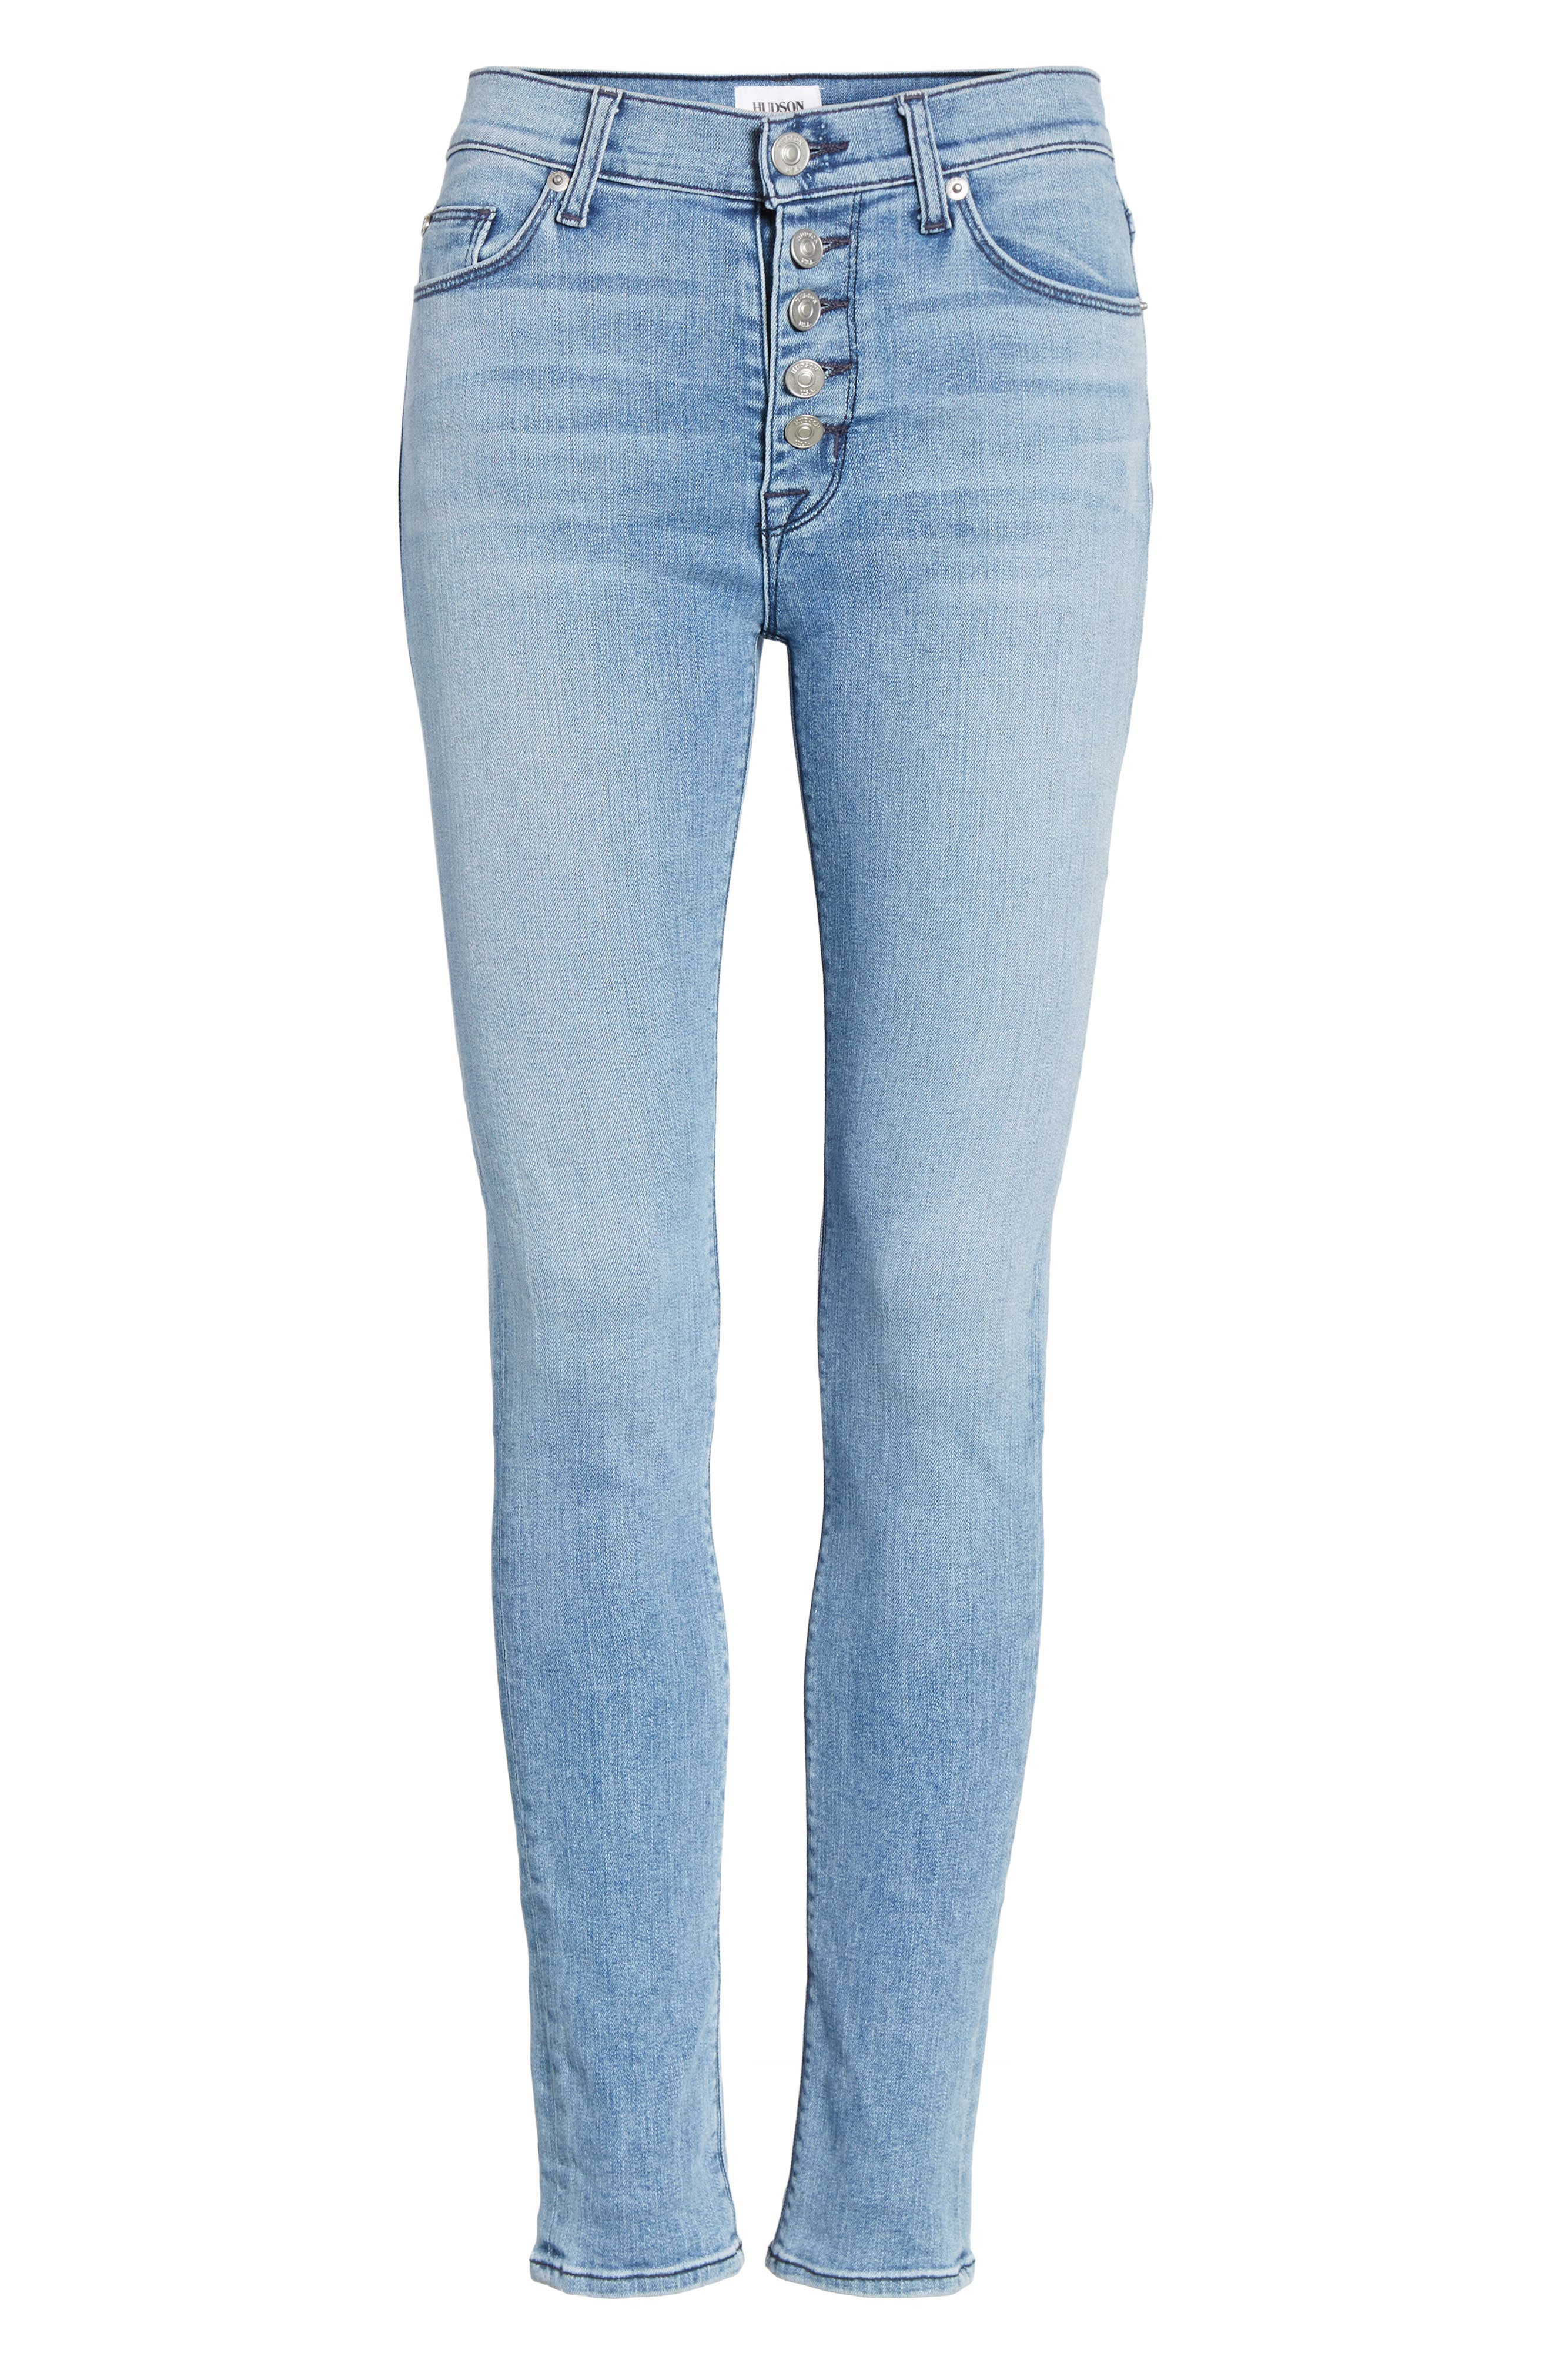 Ciara High Waist Skinny Jeans,                             Alternate thumbnail 11, color,